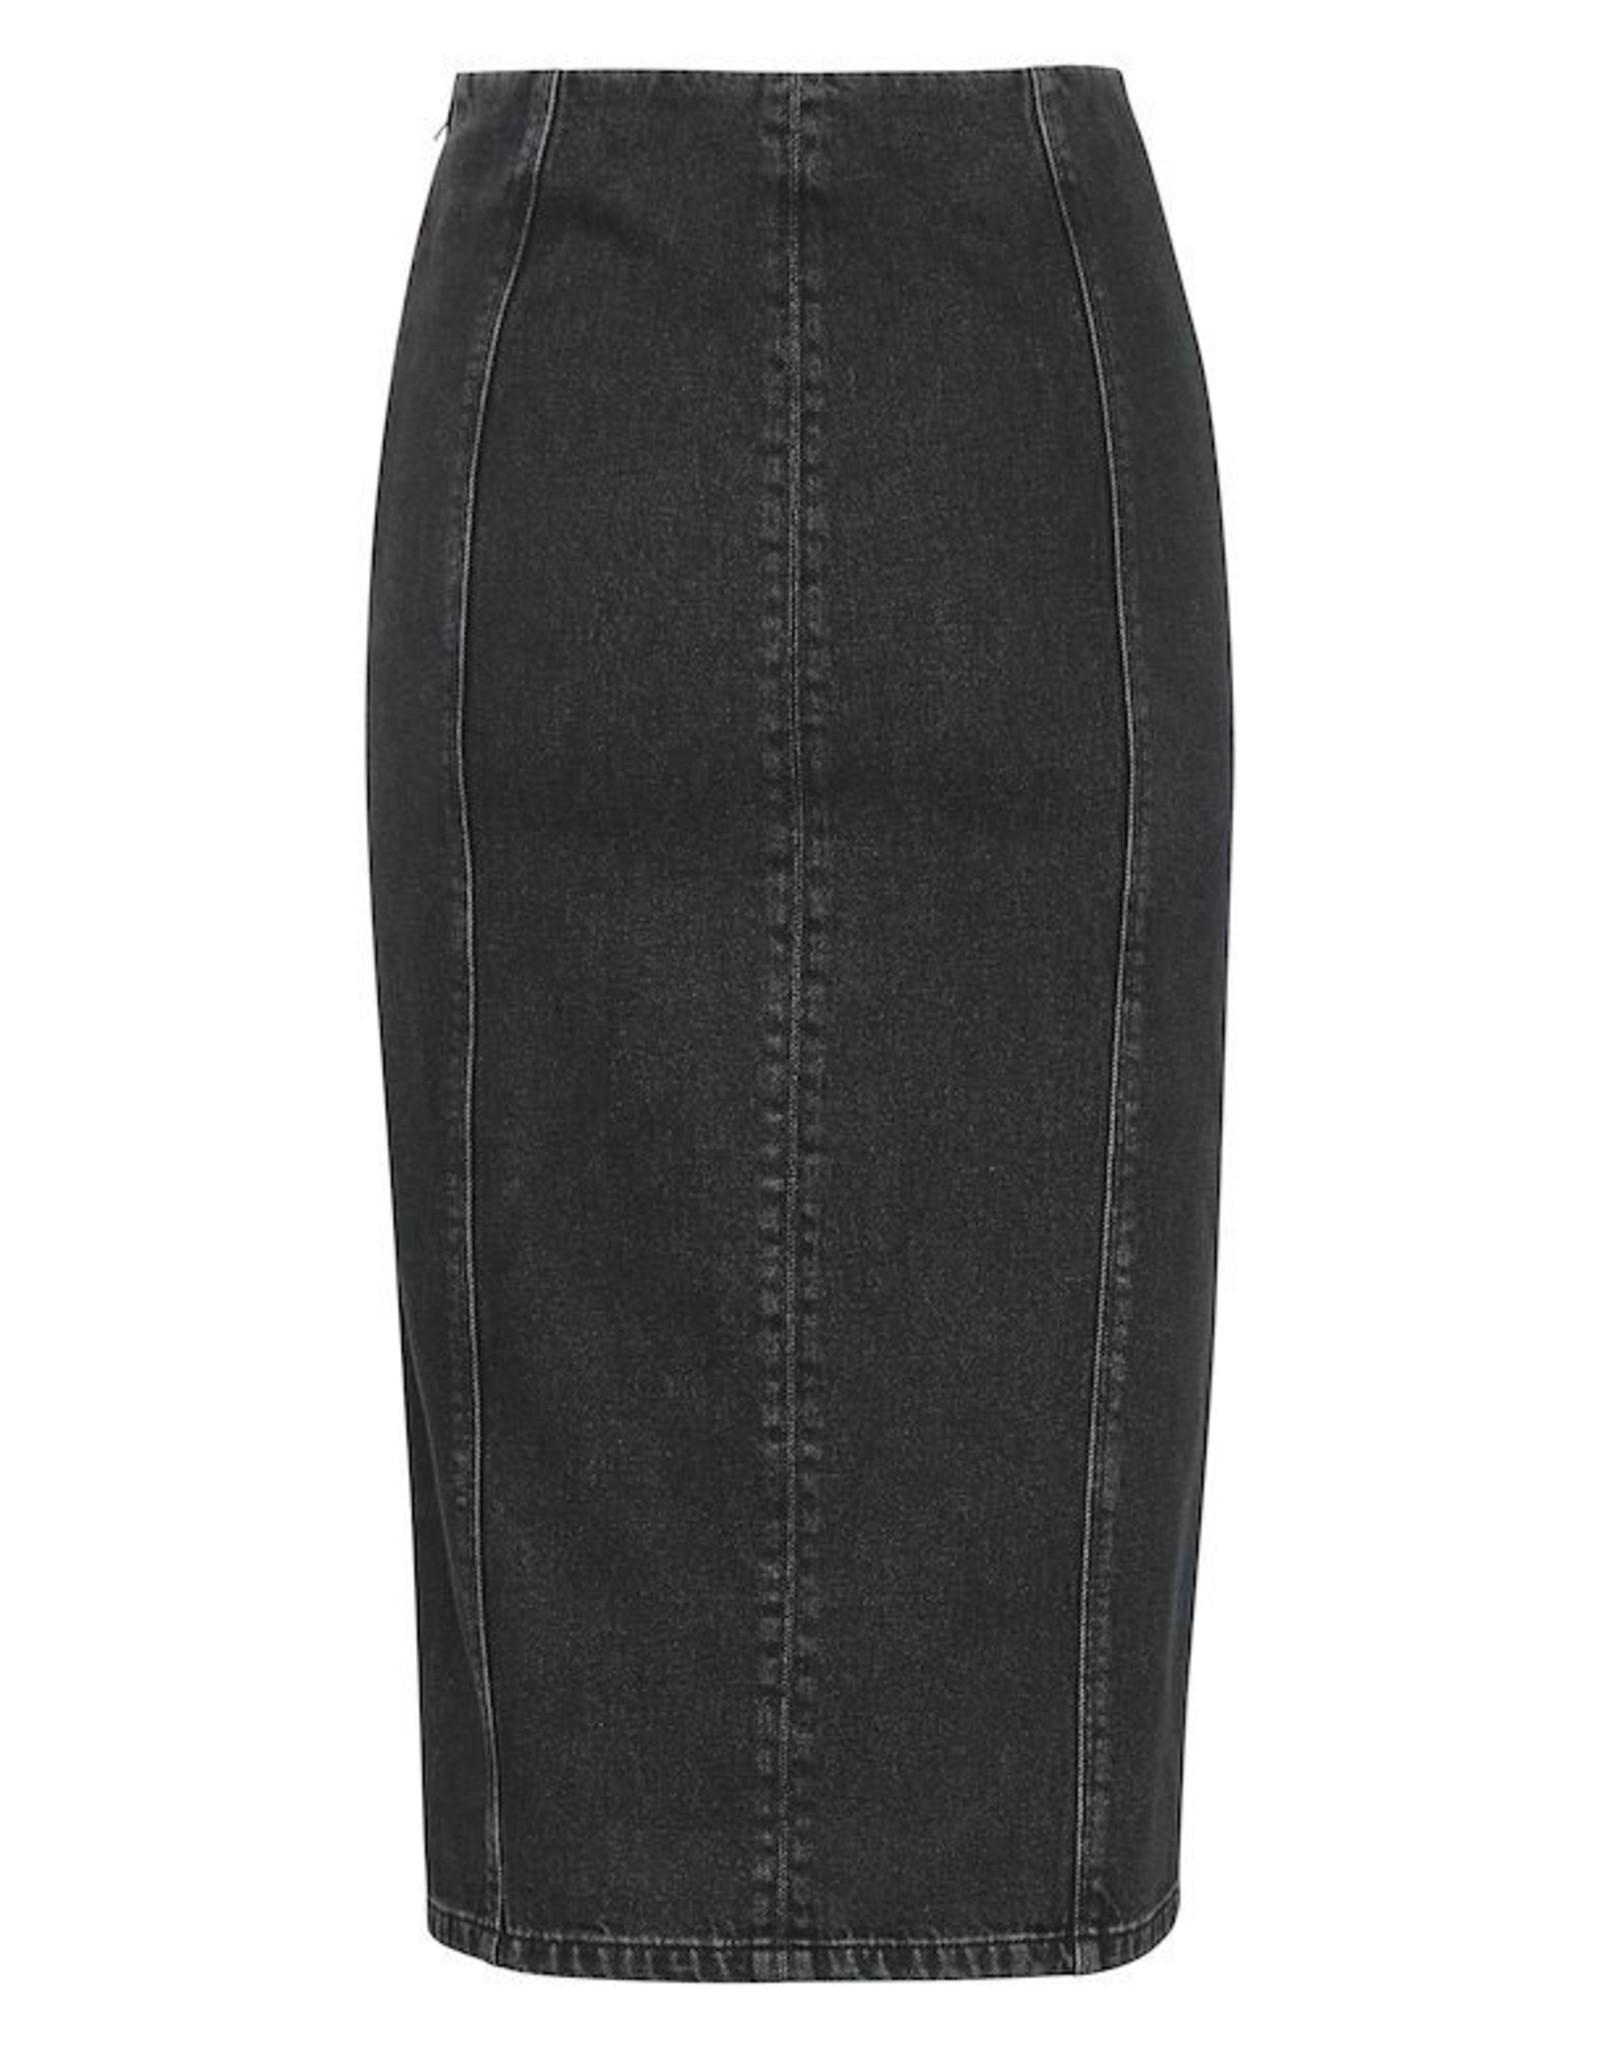 Gestuz Dena HW Midi Skirt Washed Black